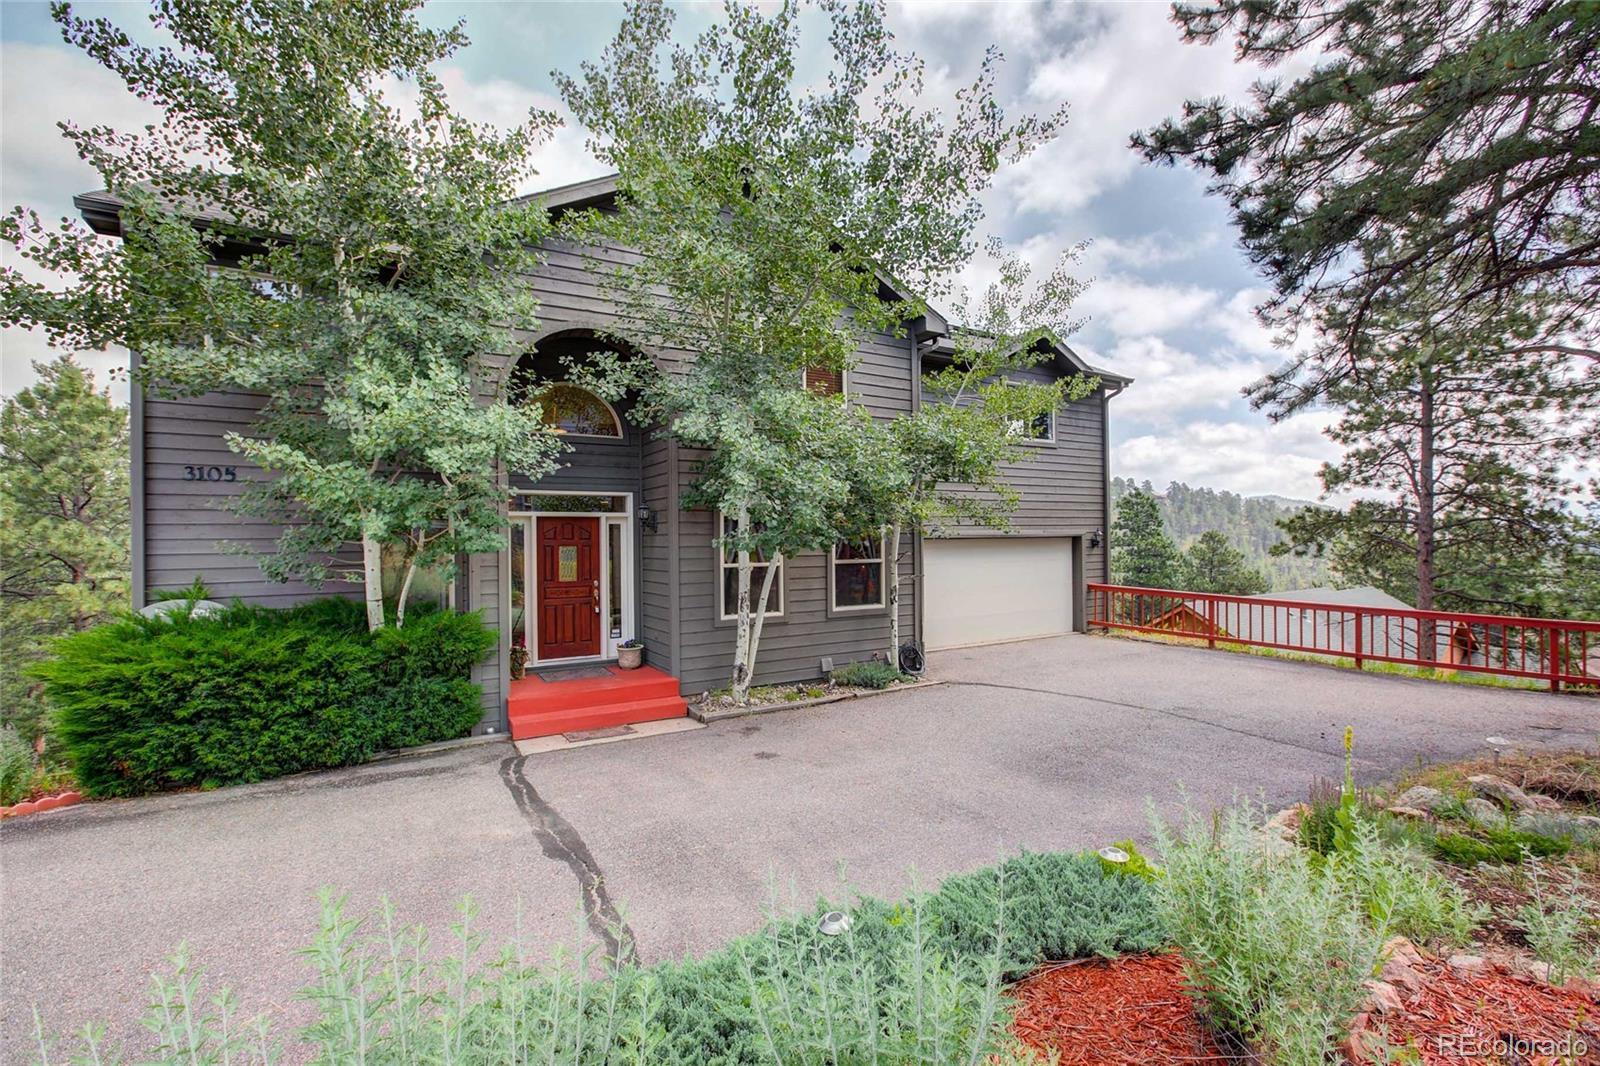 3105 Dandy Lion Lane, Evergreen, CO 80439 - Evergreen, CO real estate listing